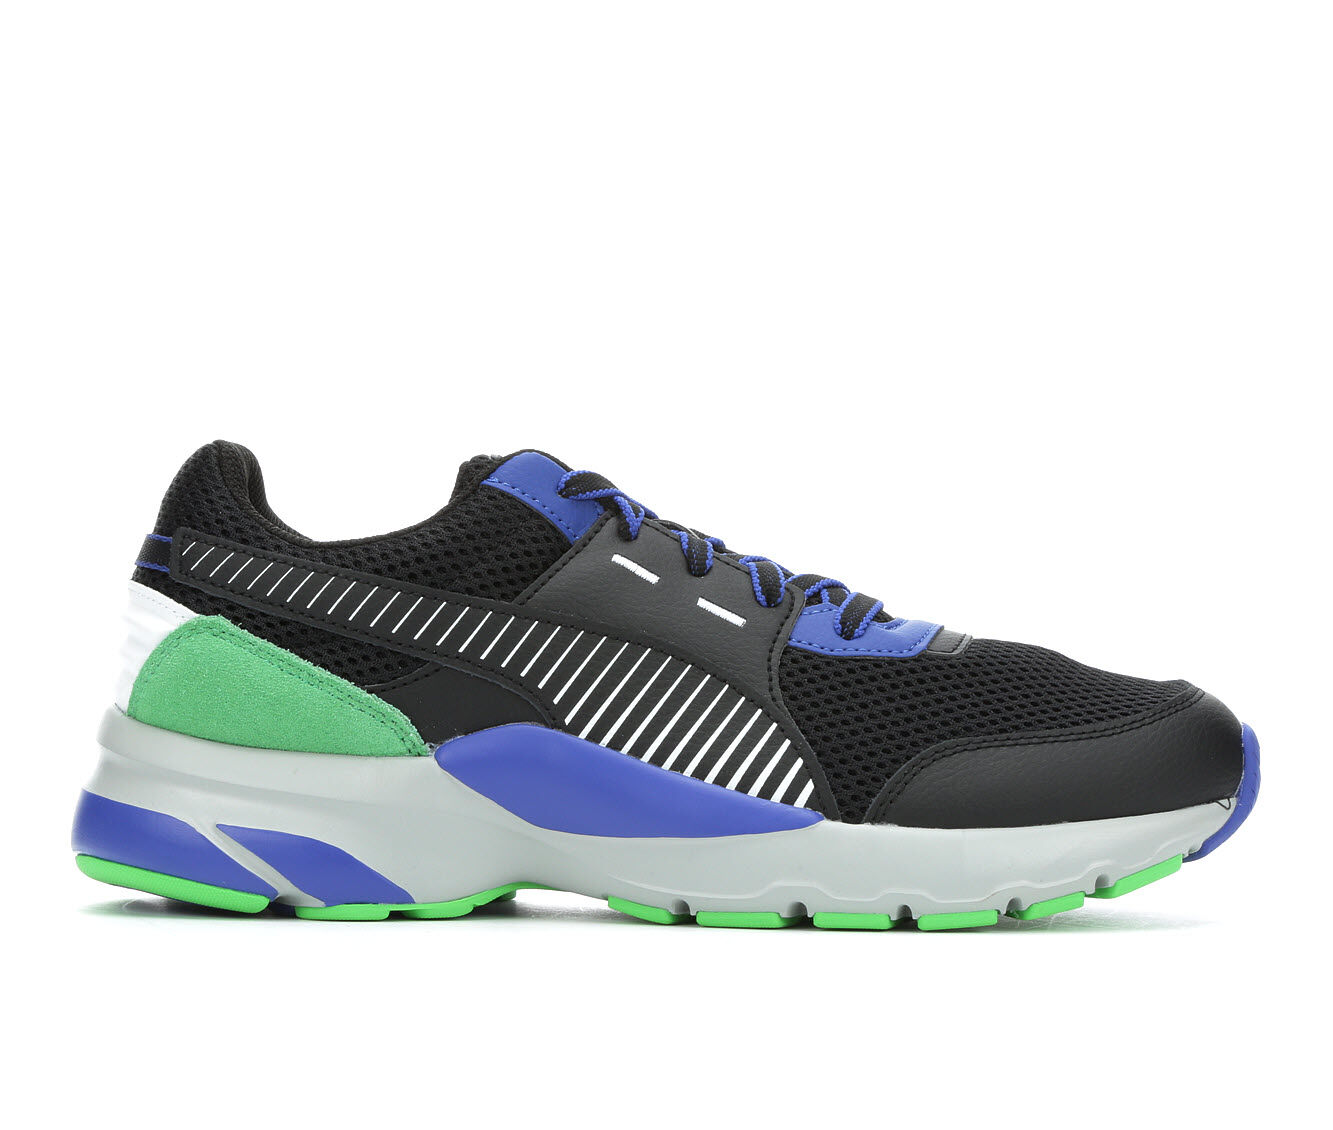 Men's Puma Future Runner Sneakers Blk/Blu/Grn